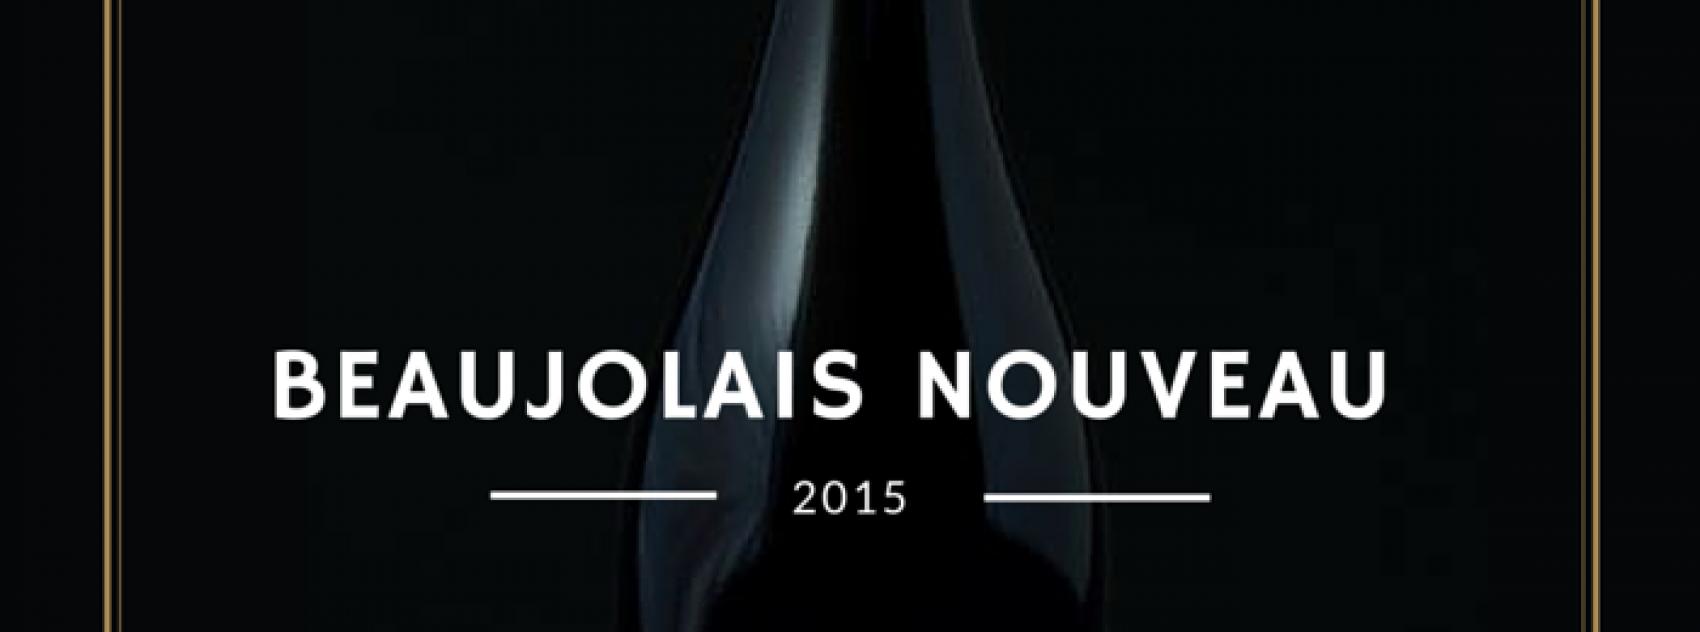 Beaujolais Nouveau 3